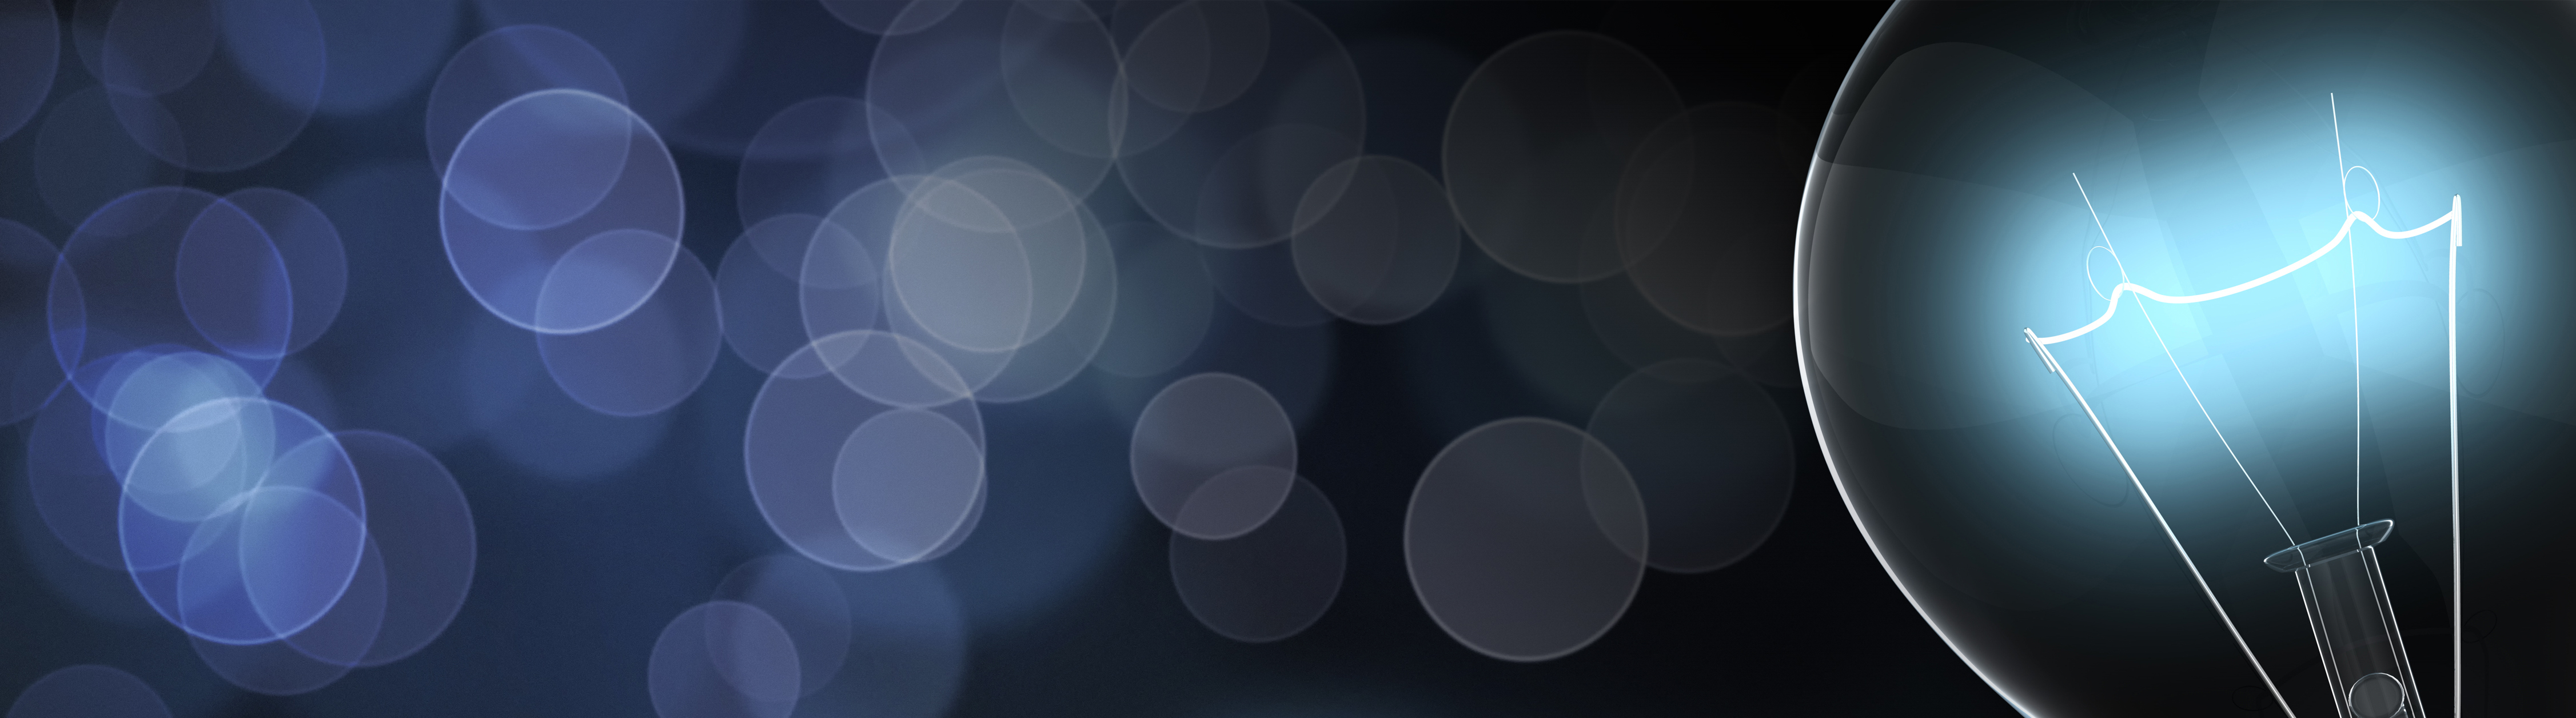 bubble bulb.jpg